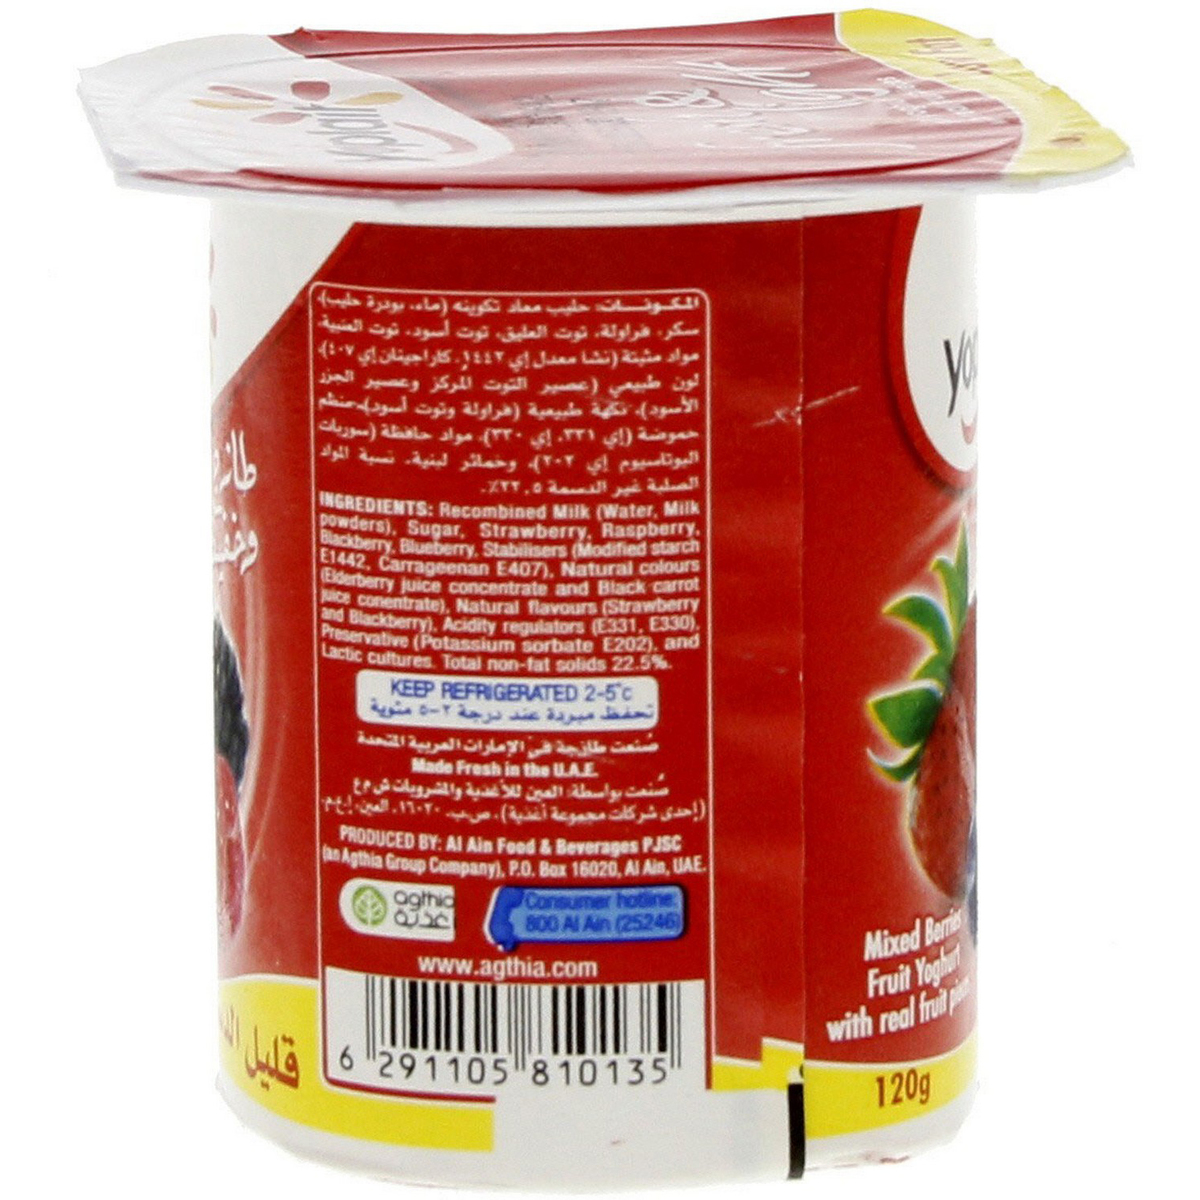 Mixed Berries Fruit Yoghurt Low Fat